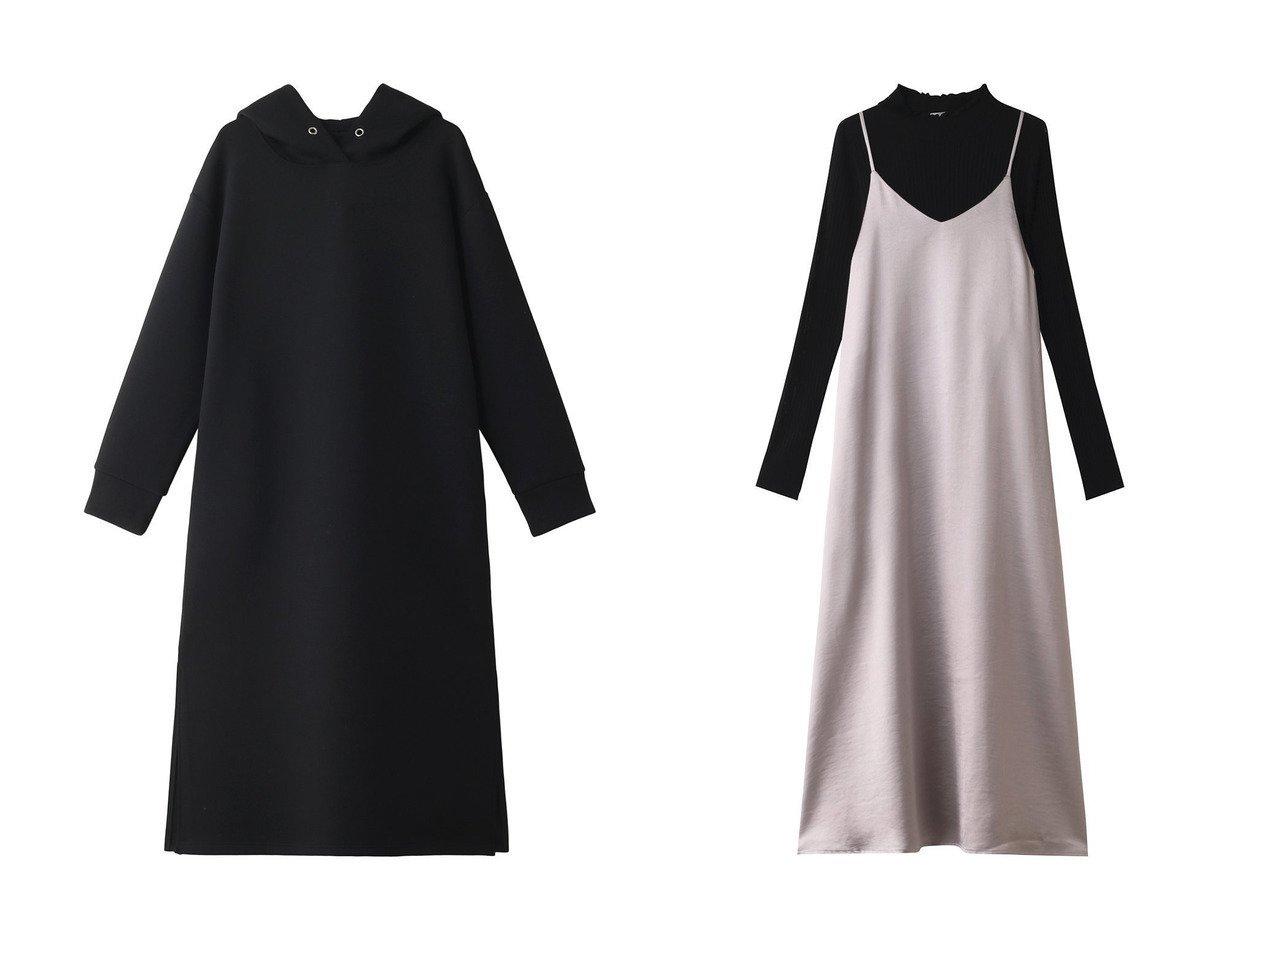 【allureville/アルアバイル】のダンボールフーディスリットワンピース&【Ezick/エジック】のサテンキャミタートルニットSET ワンピース・ドレスのおすすめ!人気、トレンド・レディースファッションの通販 おすすめで人気の流行・トレンド、ファッションの通販商品 メンズファッション・キッズファッション・インテリア・家具・レディースファッション・服の通販 founy(ファニー) https://founy.com/ ファッション Fashion レディースファッション WOMEN ワンピース Dress トップス Tops Tshirt ニット Knit Tops キャミソール / ノースリーブ No Sleeves プルオーバー Pullover スリット フォルム リラックス キャミワンピース サテン シンプル タートル フィット |ID:crp329100000009356